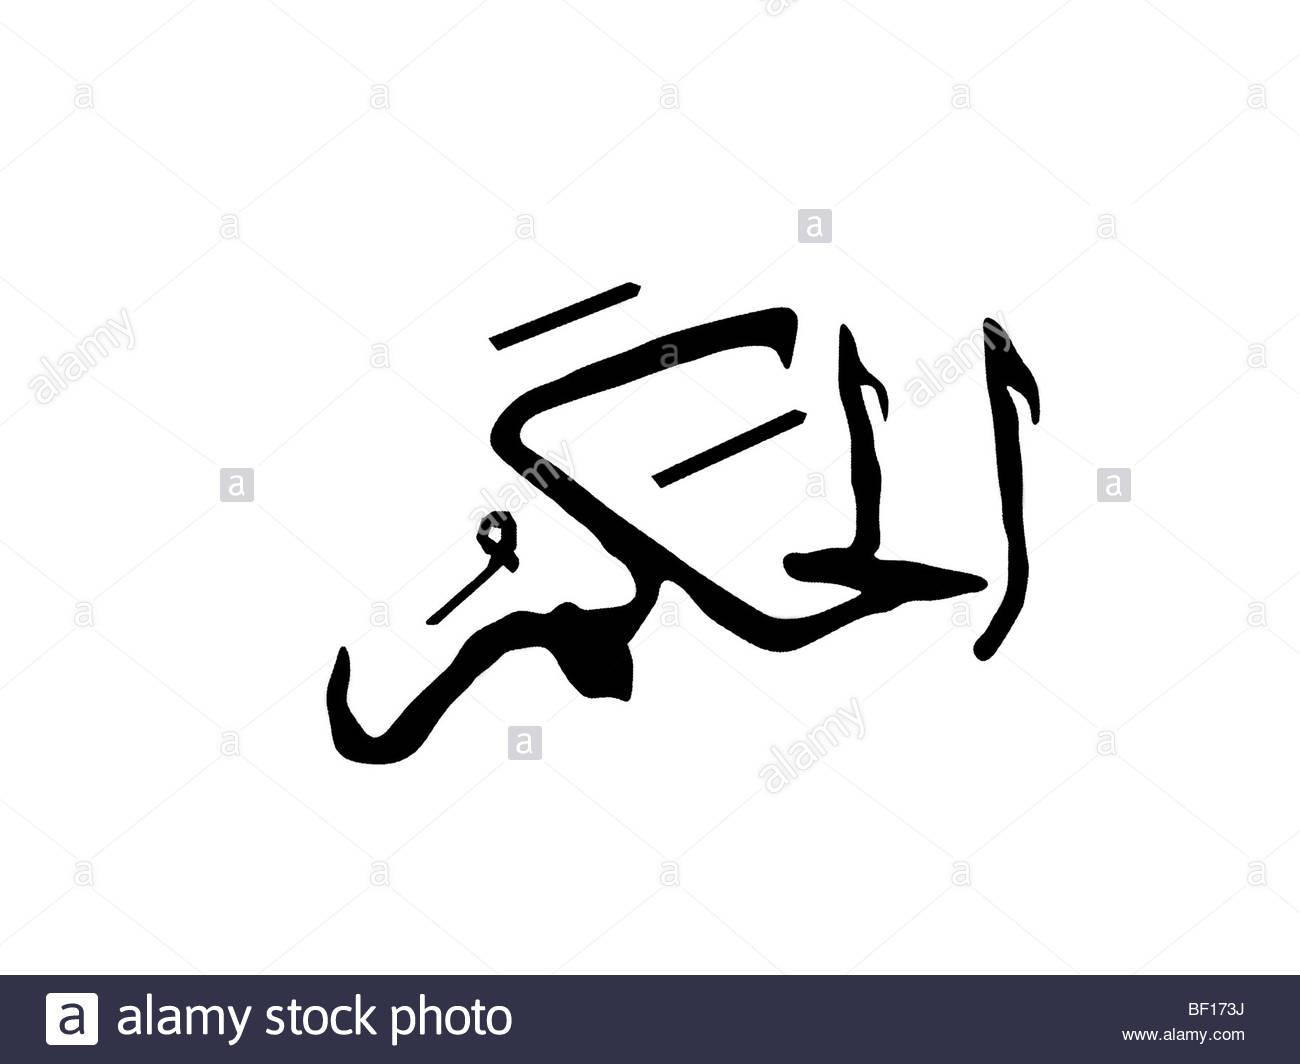 Islamic Caligraphy Al-Hakam ( The Judge)